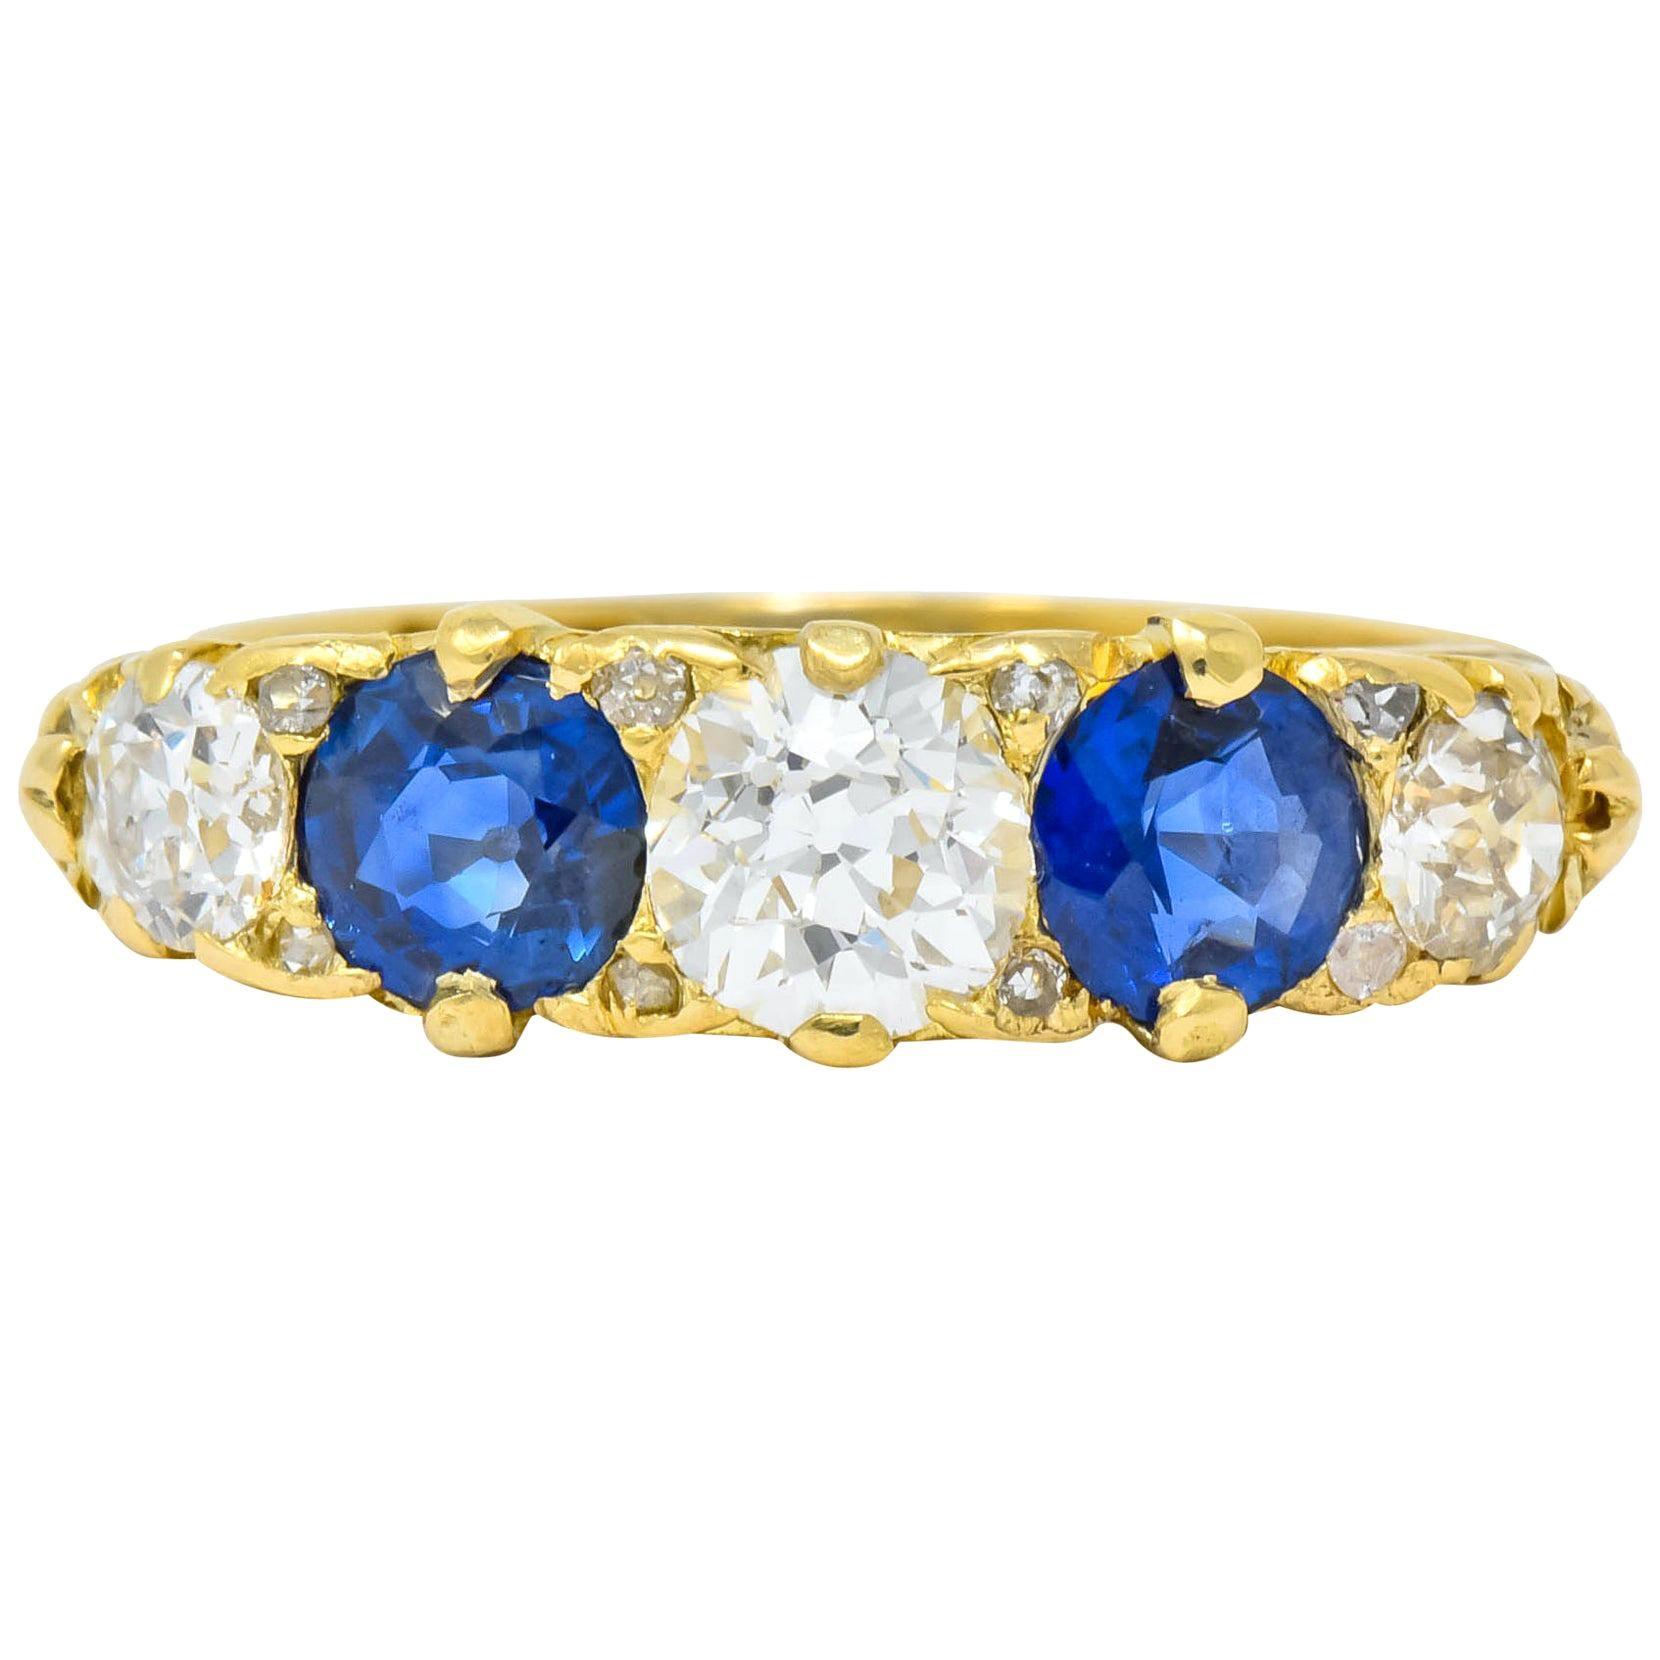 1890 Victorian 2.45 Carat Diamond Sapphire 18 Karat Gold Scrolled Band Ring